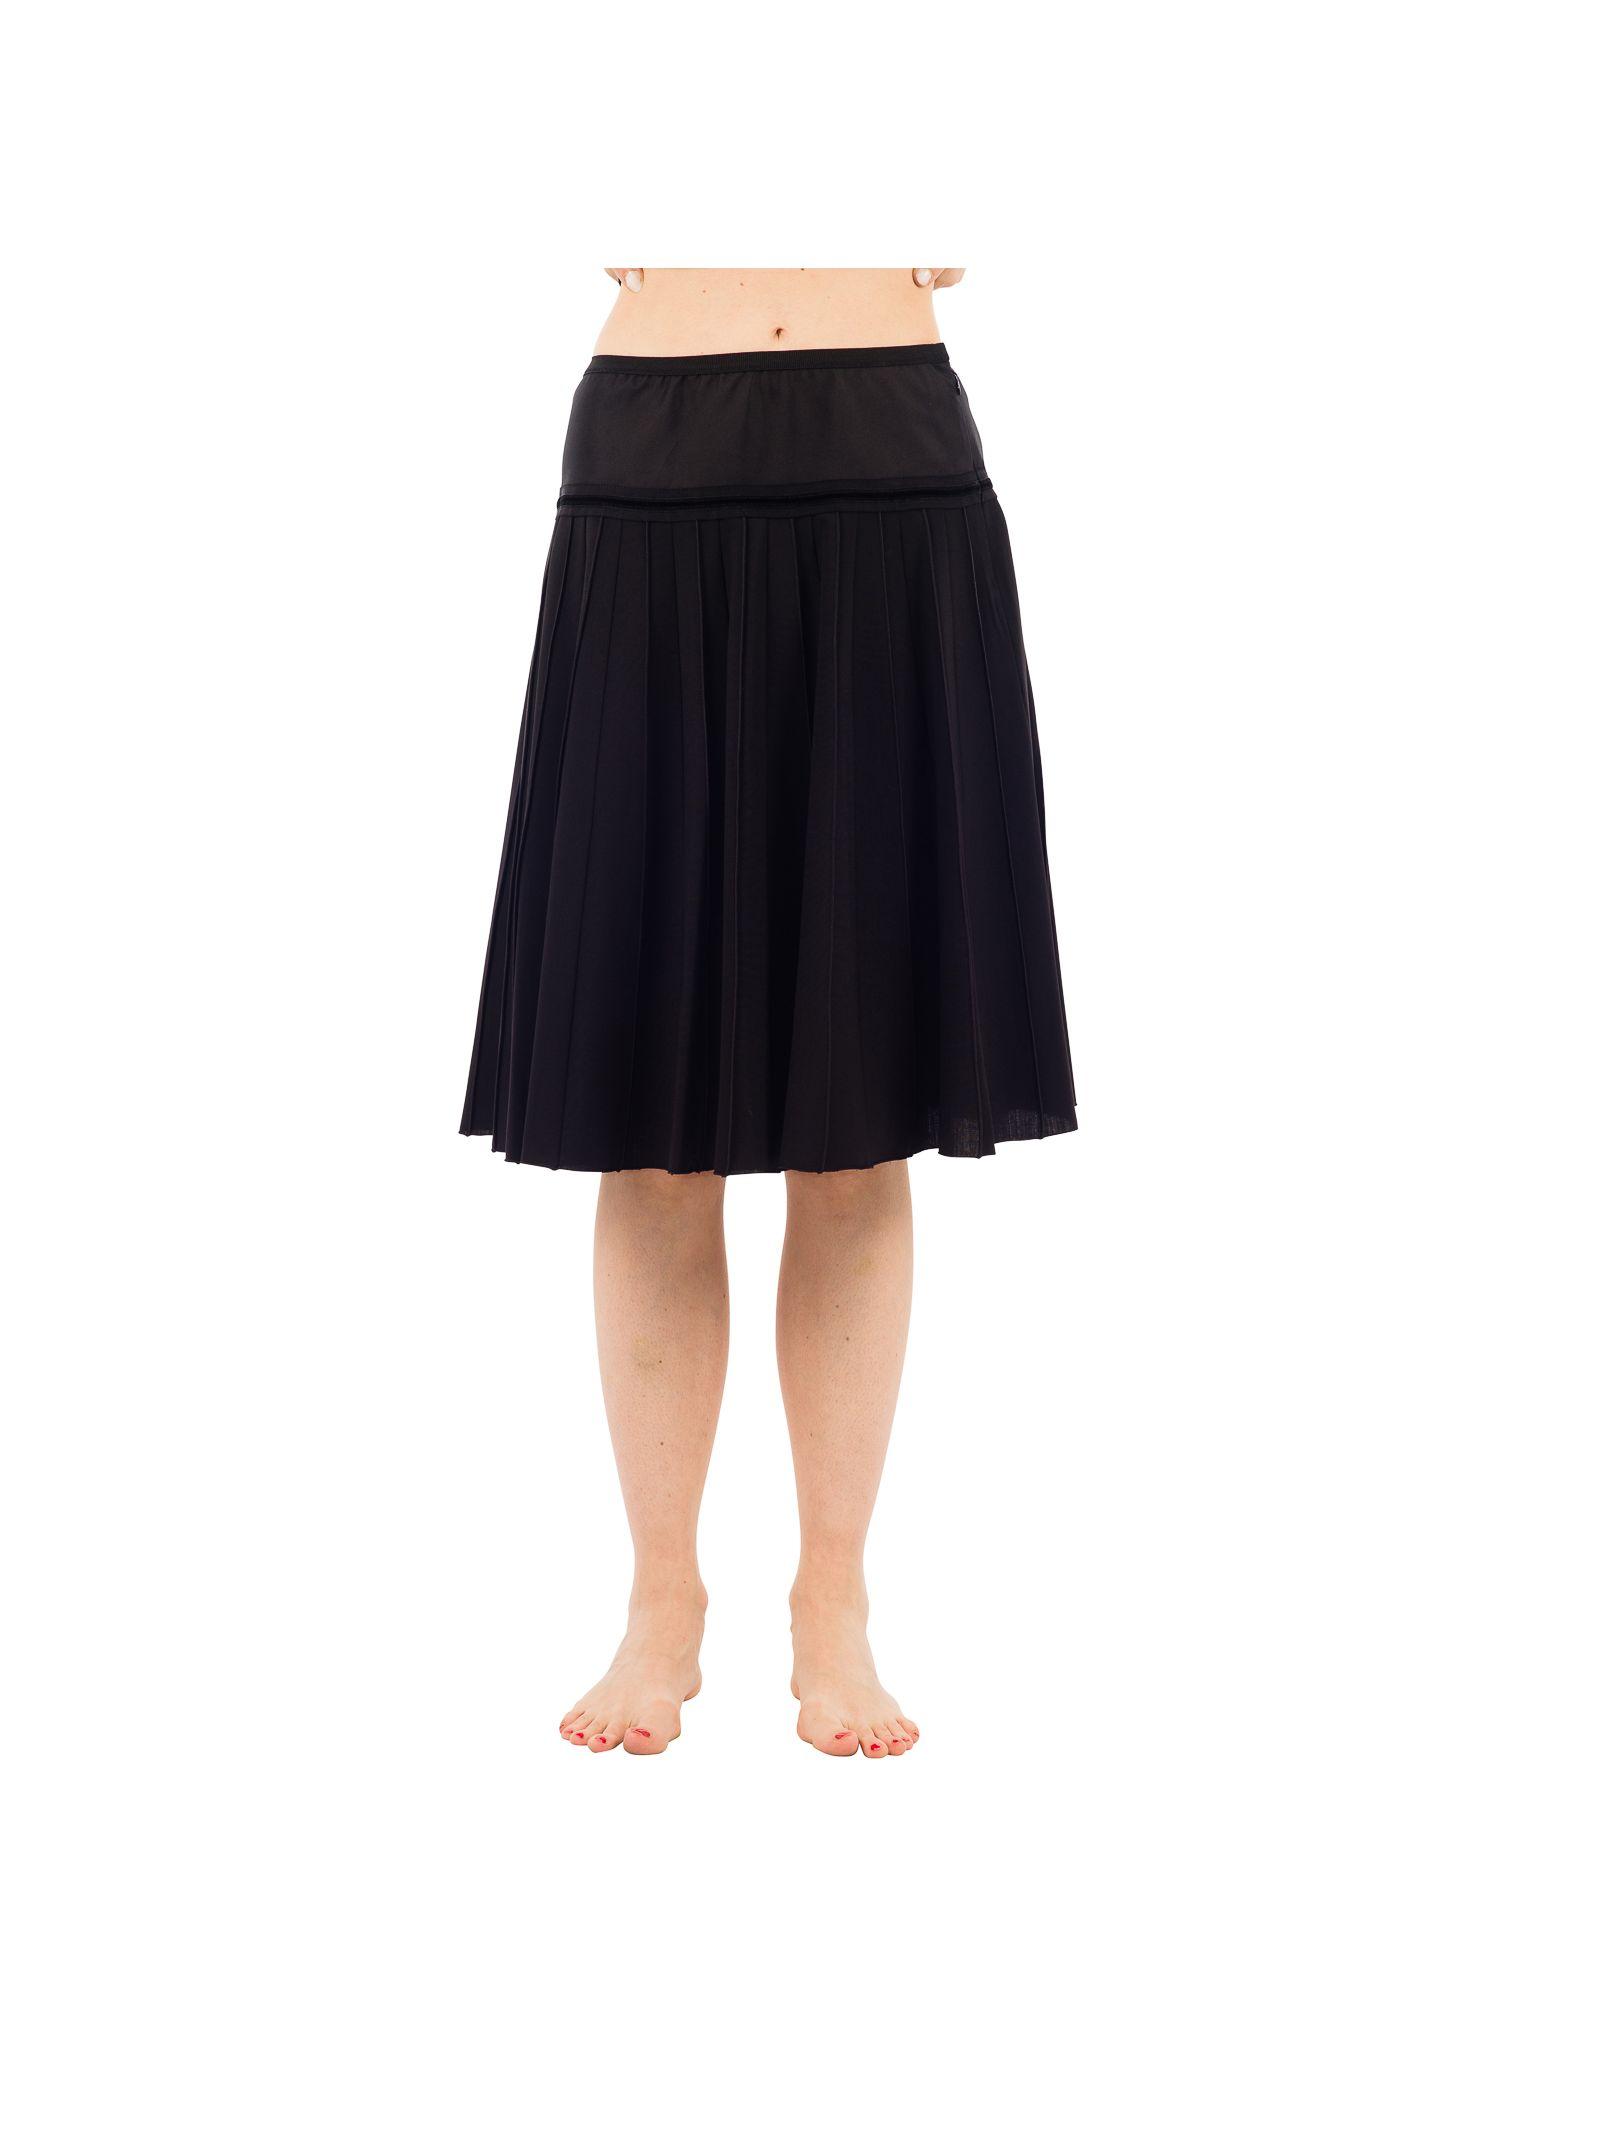 marc jacobs female 188971 marc jacobs black wool skirt